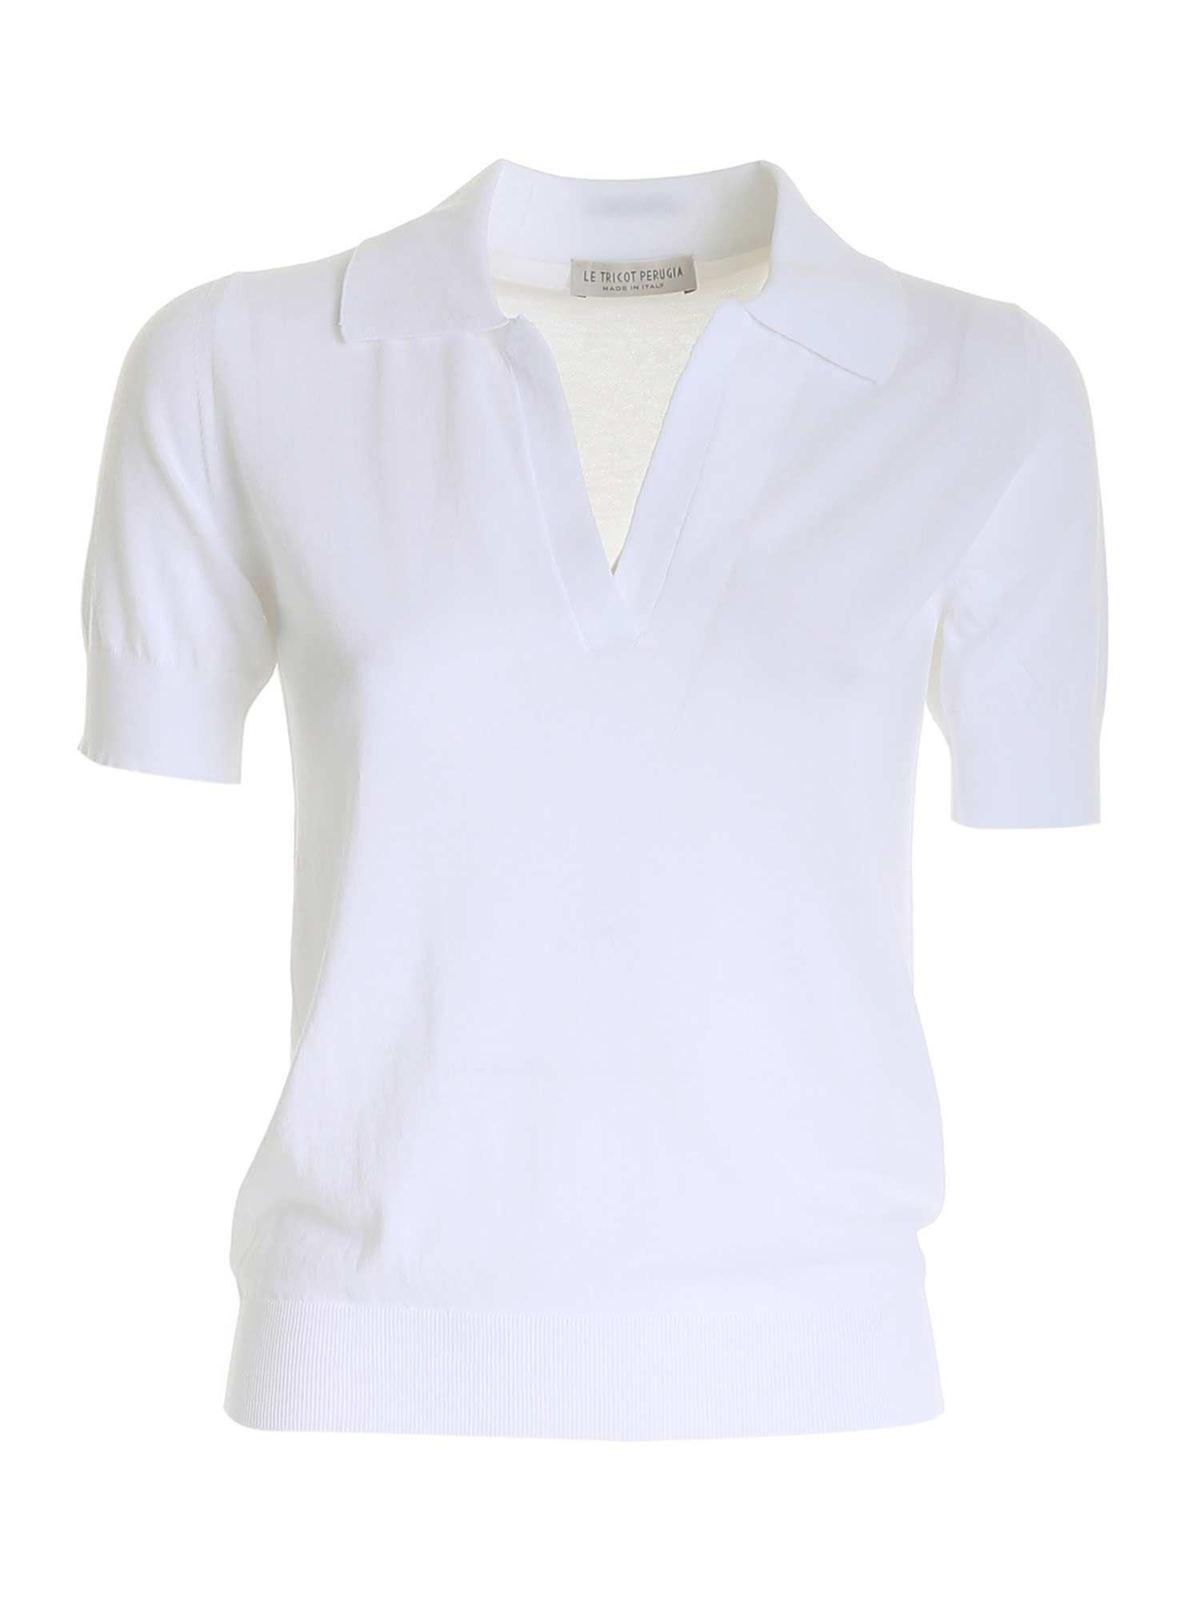 Le Tricot Perugia Cottons COTTON SWEATER IN WHITE